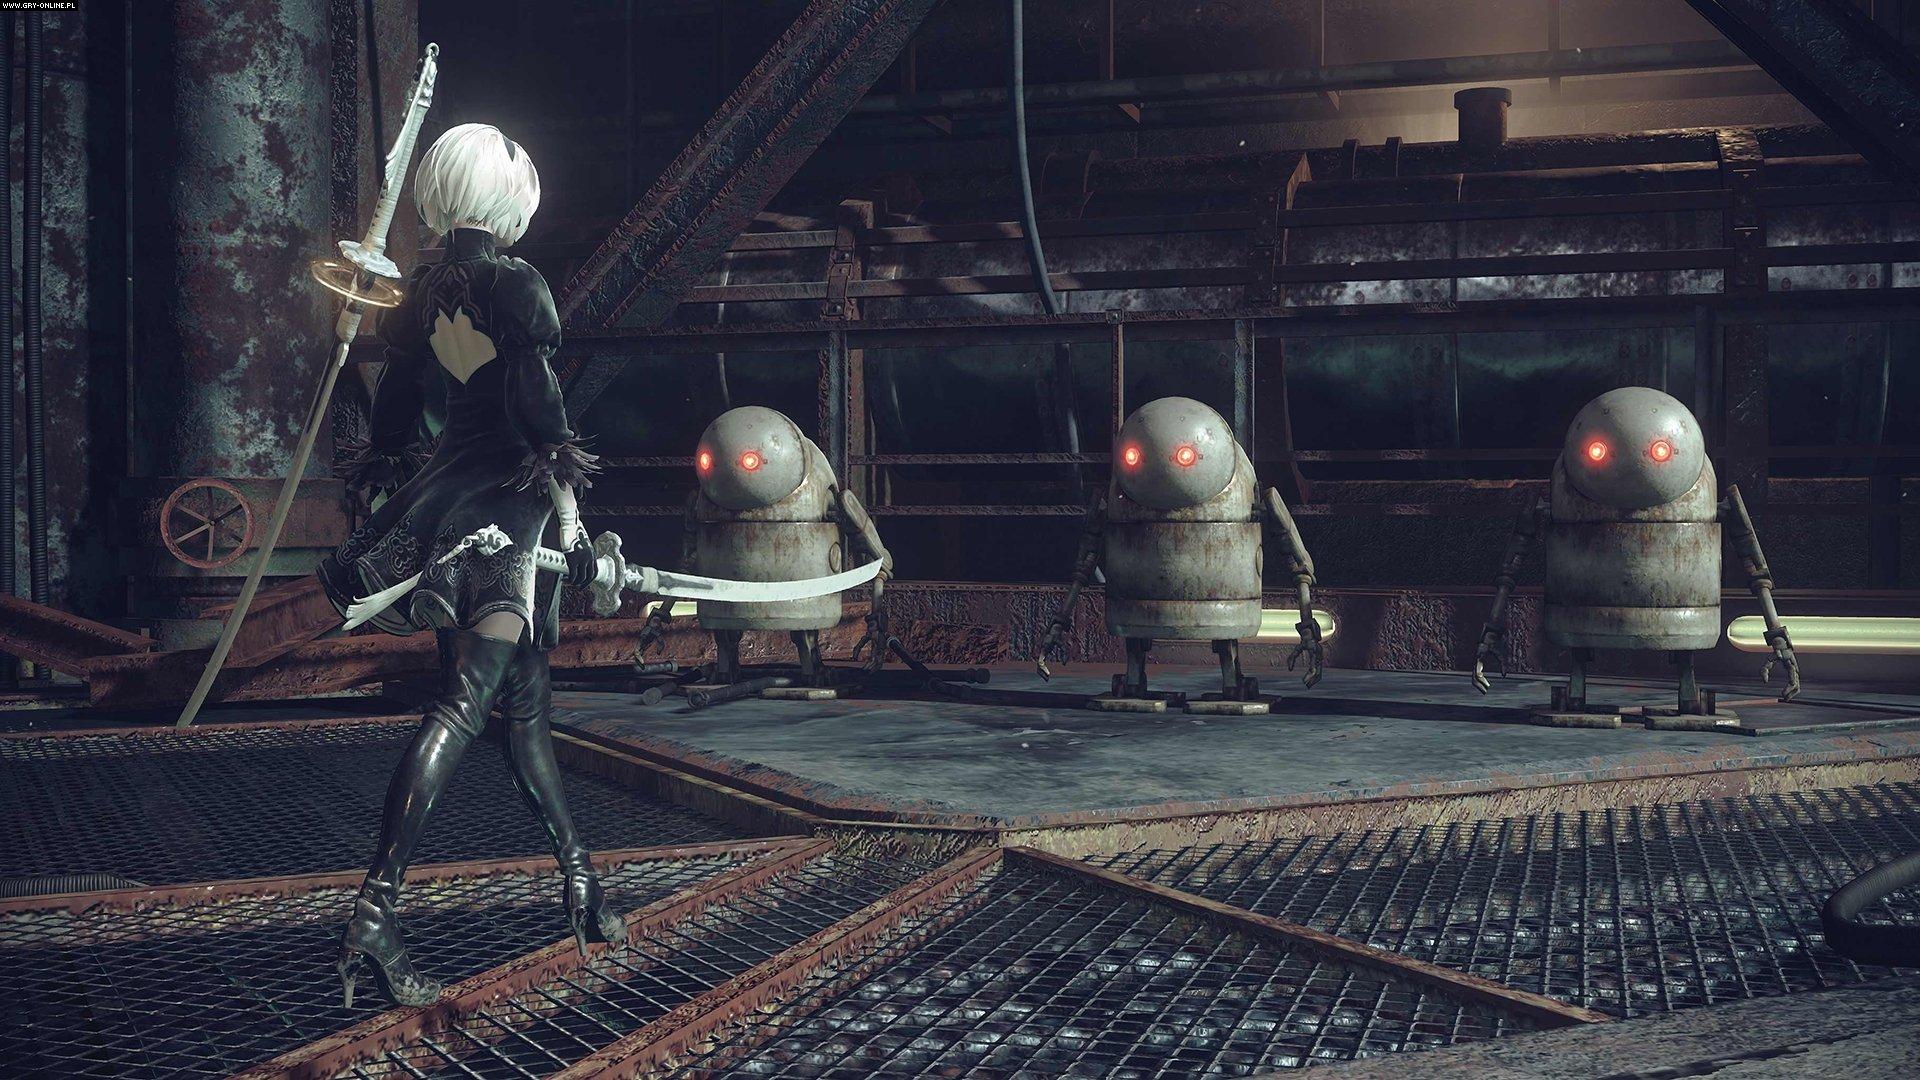 Nier: Automata PC, PS4 Games Image 14/68, PlatinumGames, Square-Enix / Eidos